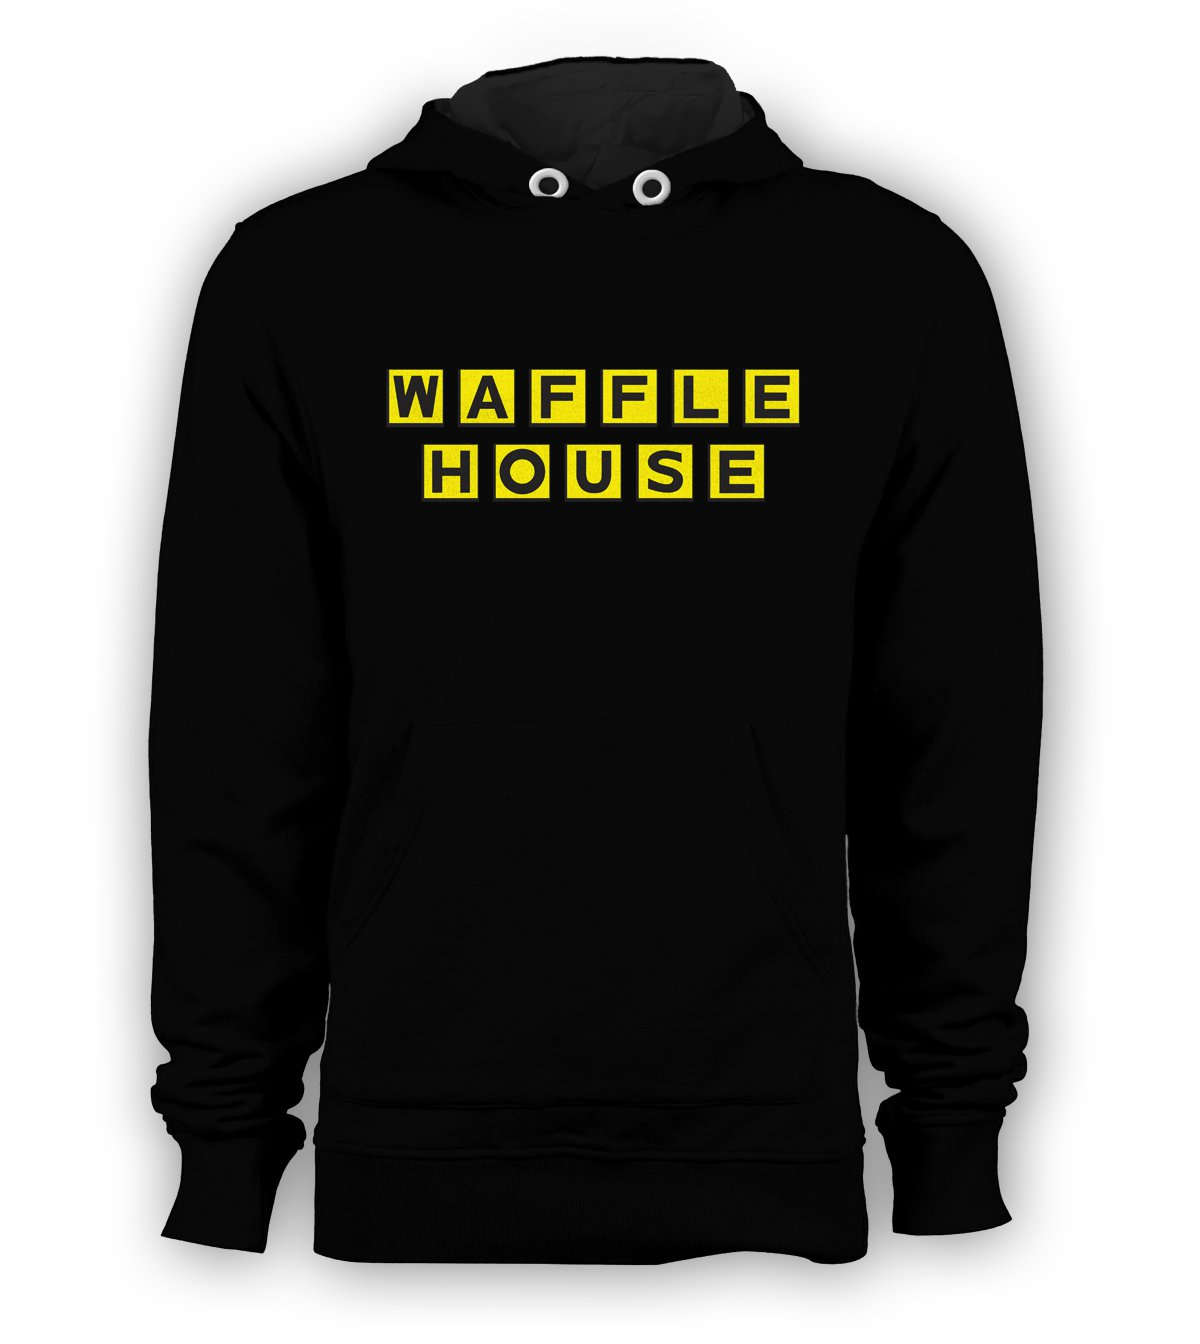 WAFFLE HOUSE Pullover Hoodie Sweatshirt Vintage logo FUNNY Cool COFFEE HOODY New